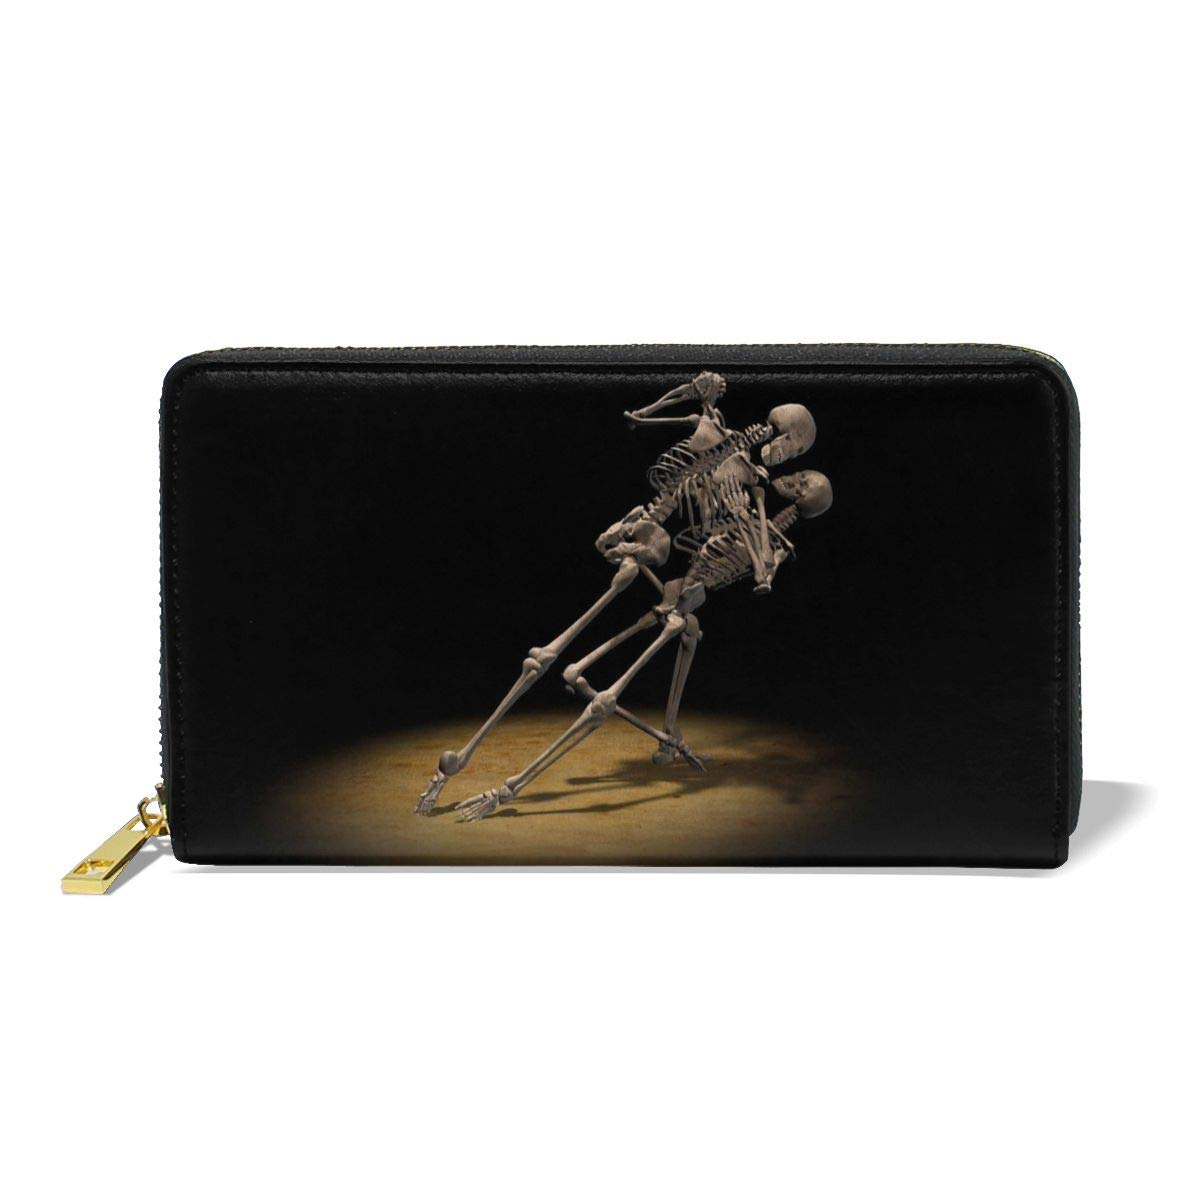 Women Genuine Leather Wallets Dance Skeleton Credit Card Holder Organizer Ladies Purse Zipper Around Clutch Cash Pocket by D-MUSE